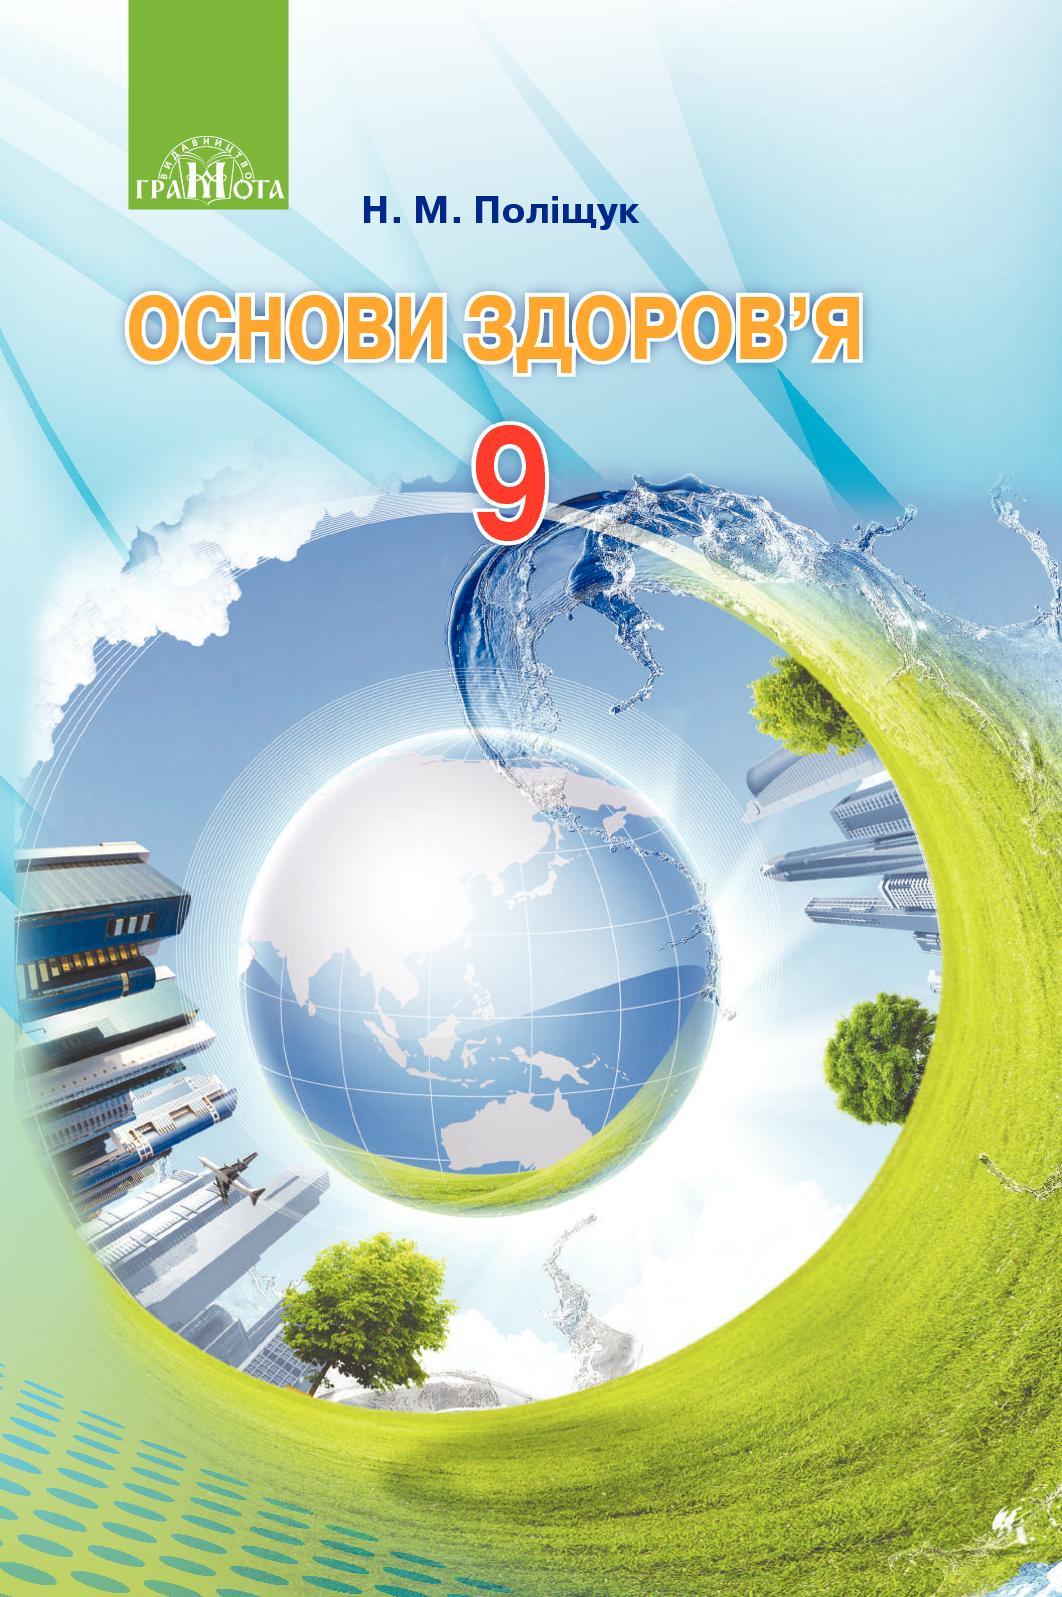 Calaméo - 9 Klas Osnovi Zdorovja Polishhuk 2017 56cd5d5b46060